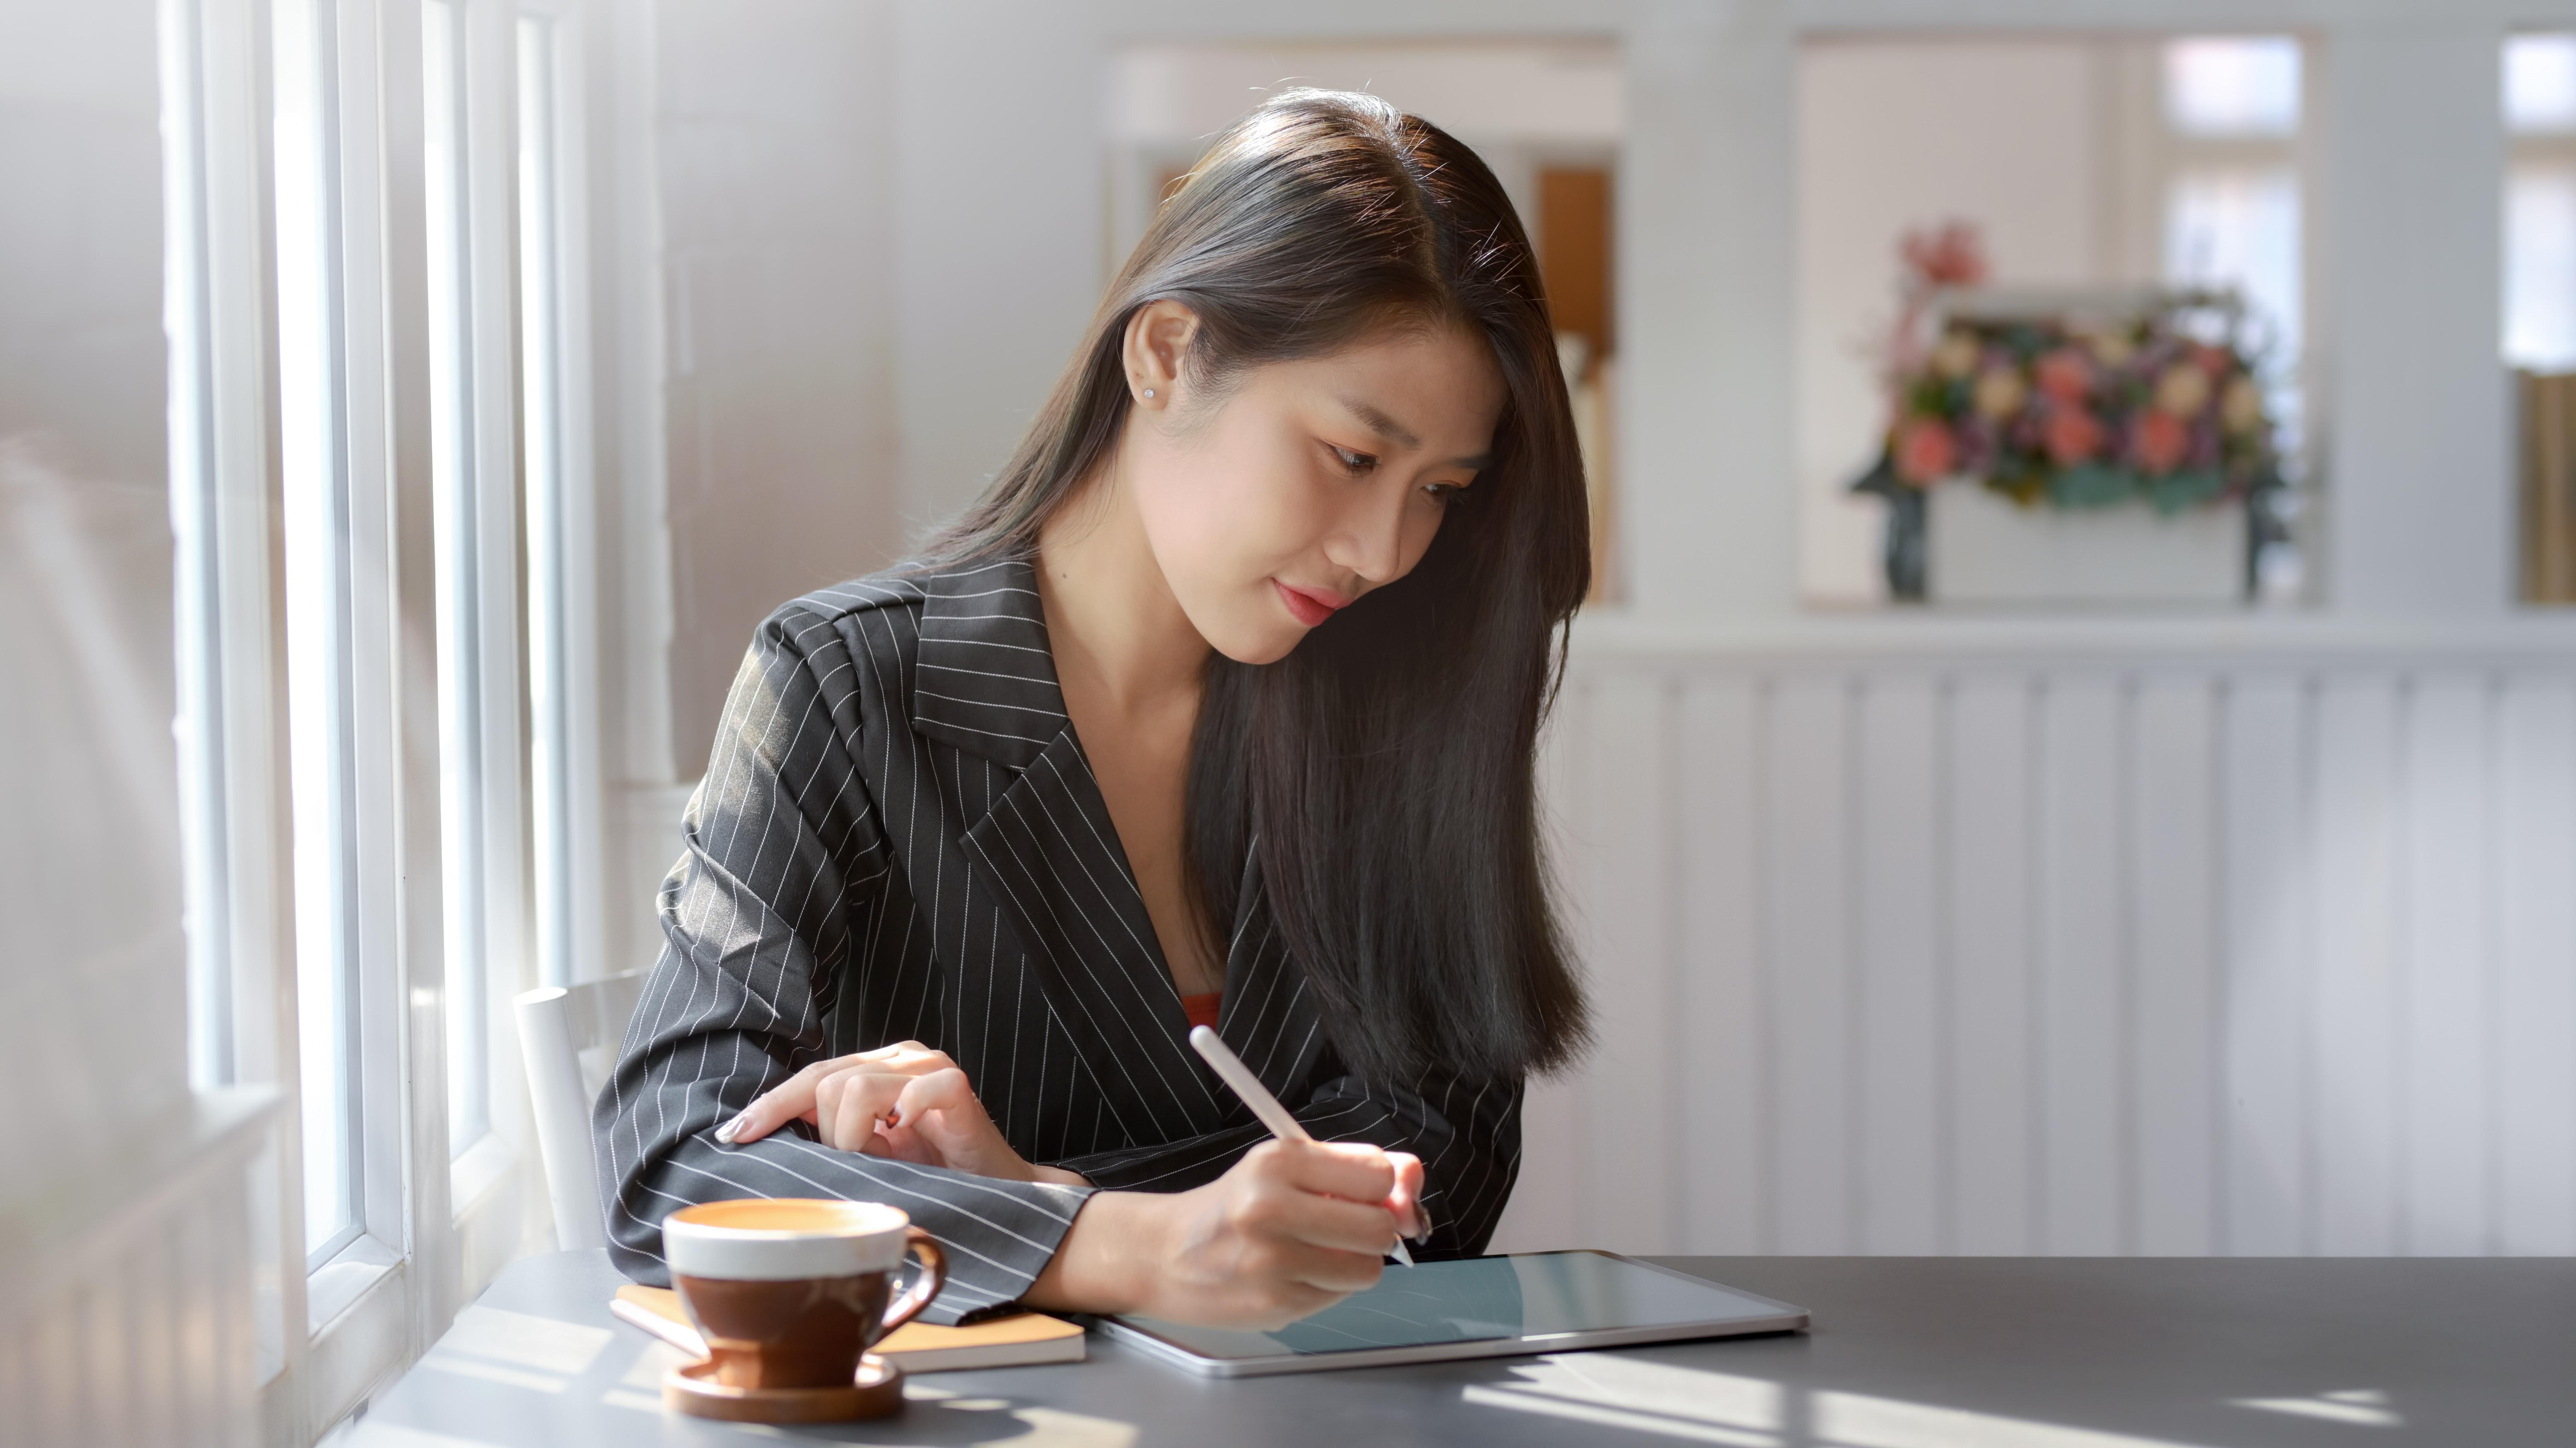 Do You Enjoy Your Job More Or Less While WFH